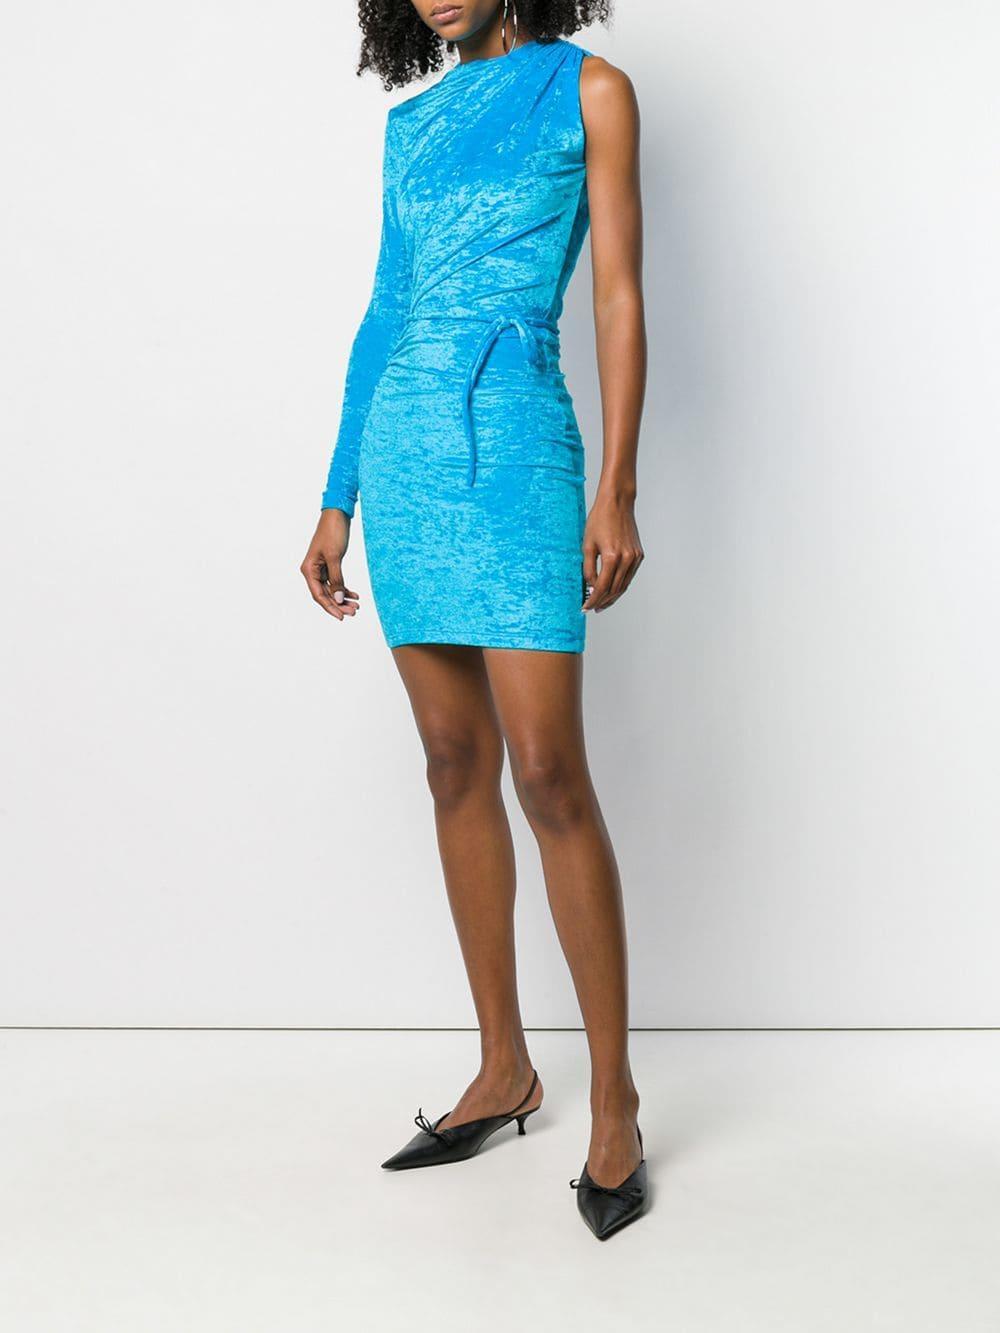 5d1605d9d2e Balenciaga Draped Mini Dress in Blue - Lyst